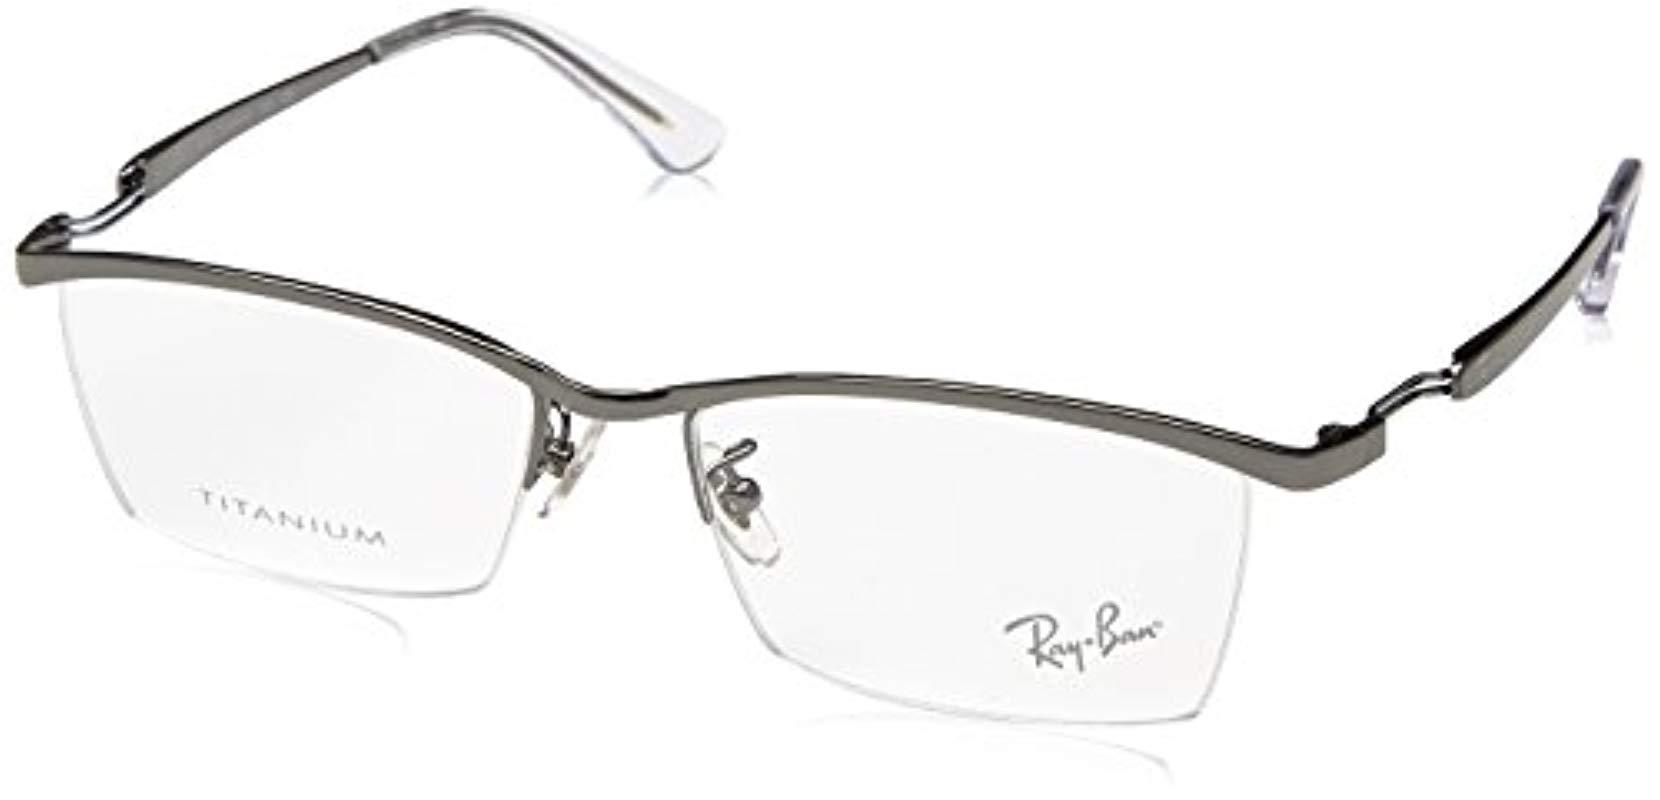 5194d3caec3 Ray-Ban 0rx 8746d 1000 55 Optical Frames